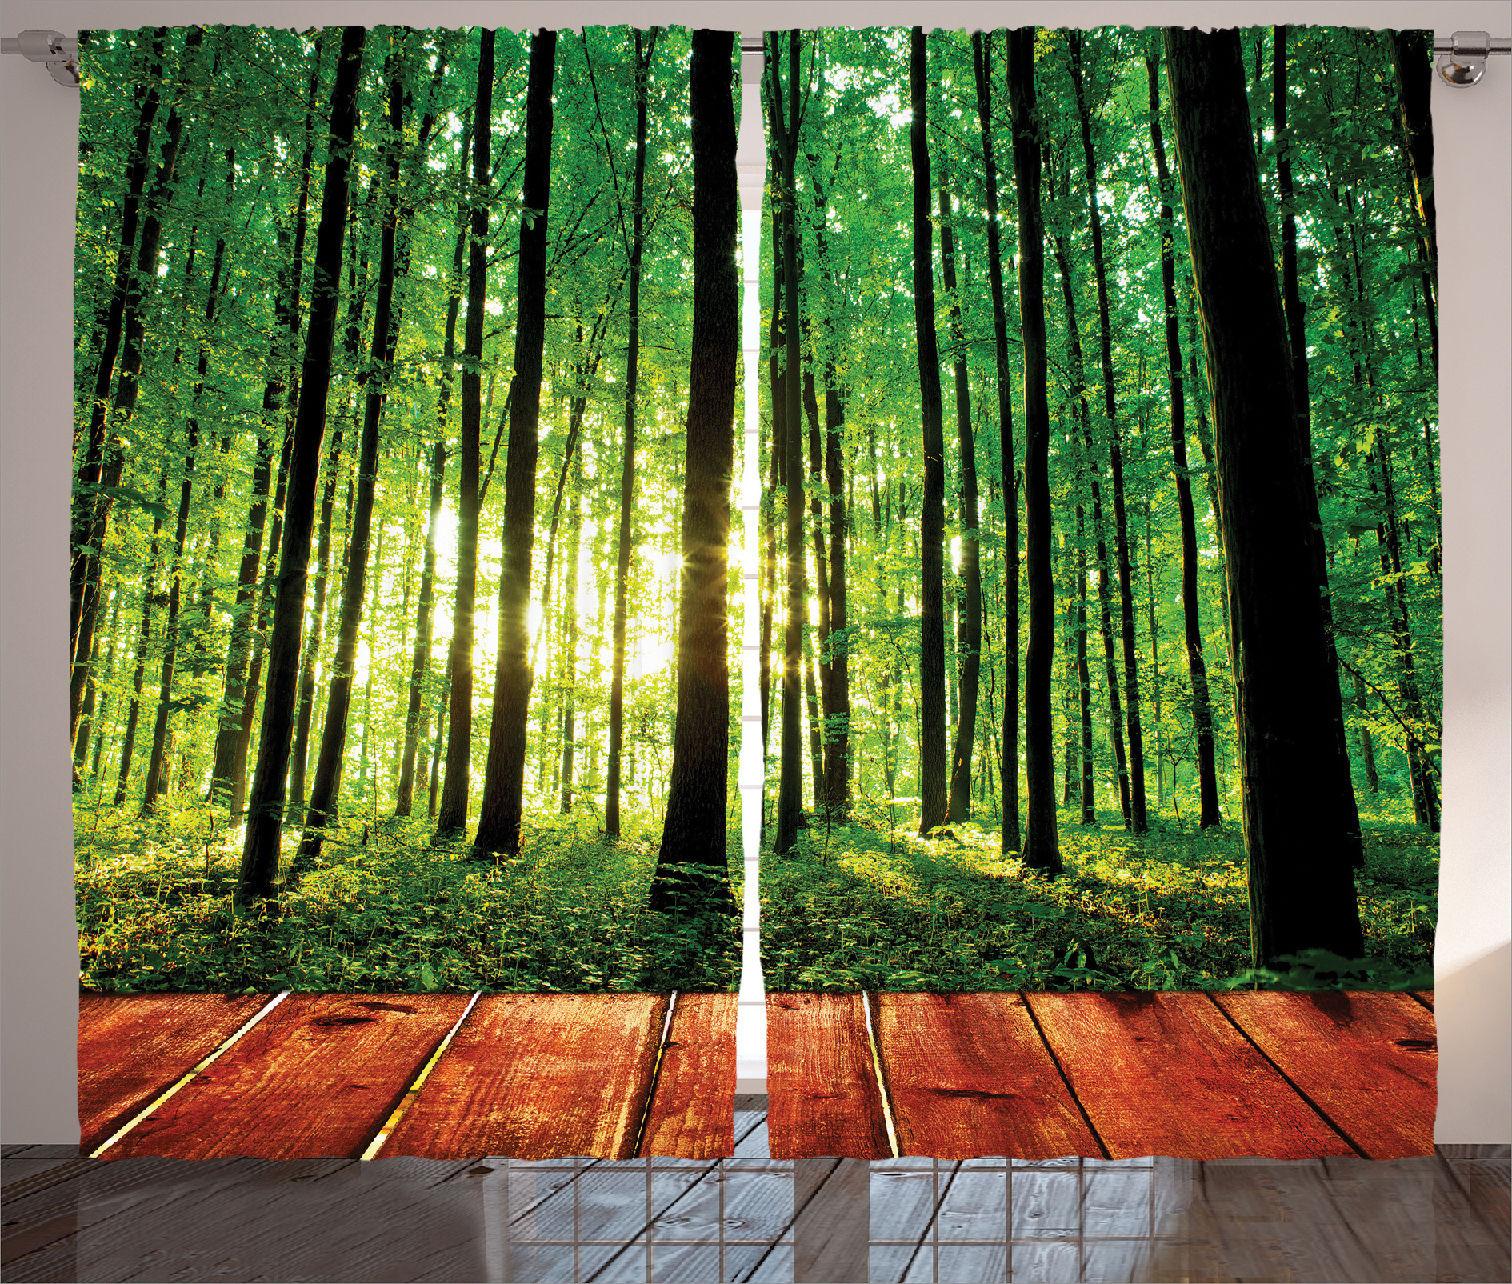 Trees Forest Image From Indoor Sunlight Wooden Floor Print